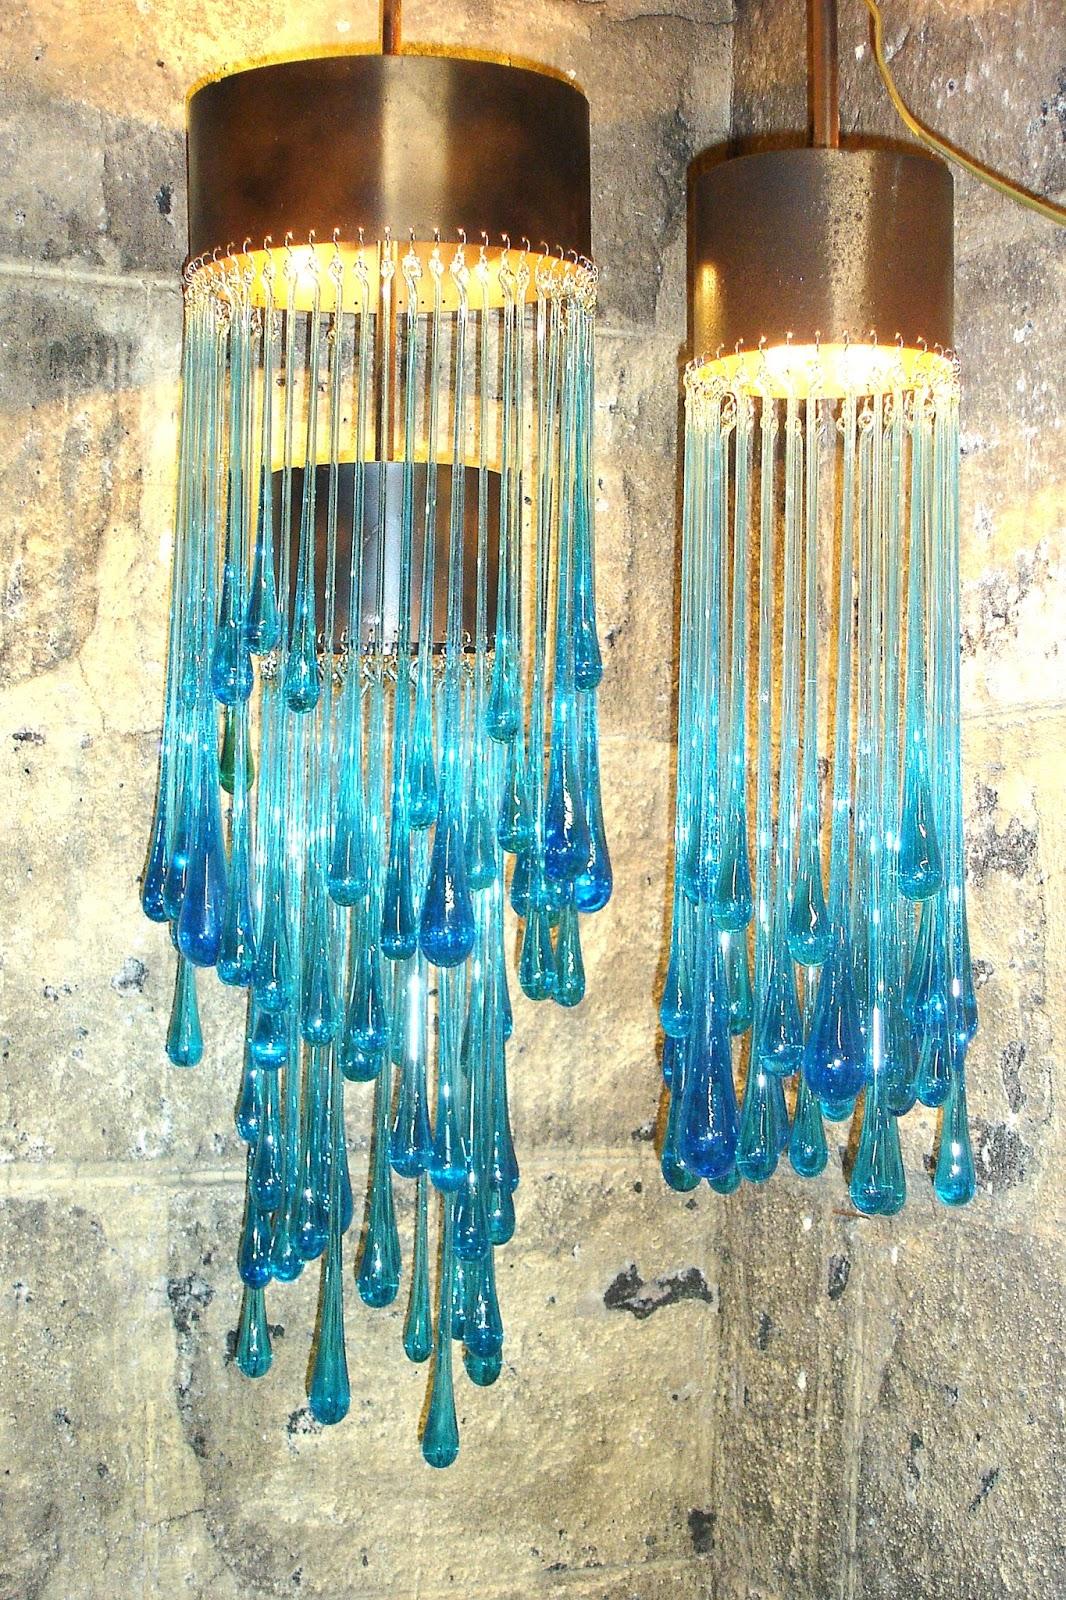 Febrero es as Modernas lmparas de cristal